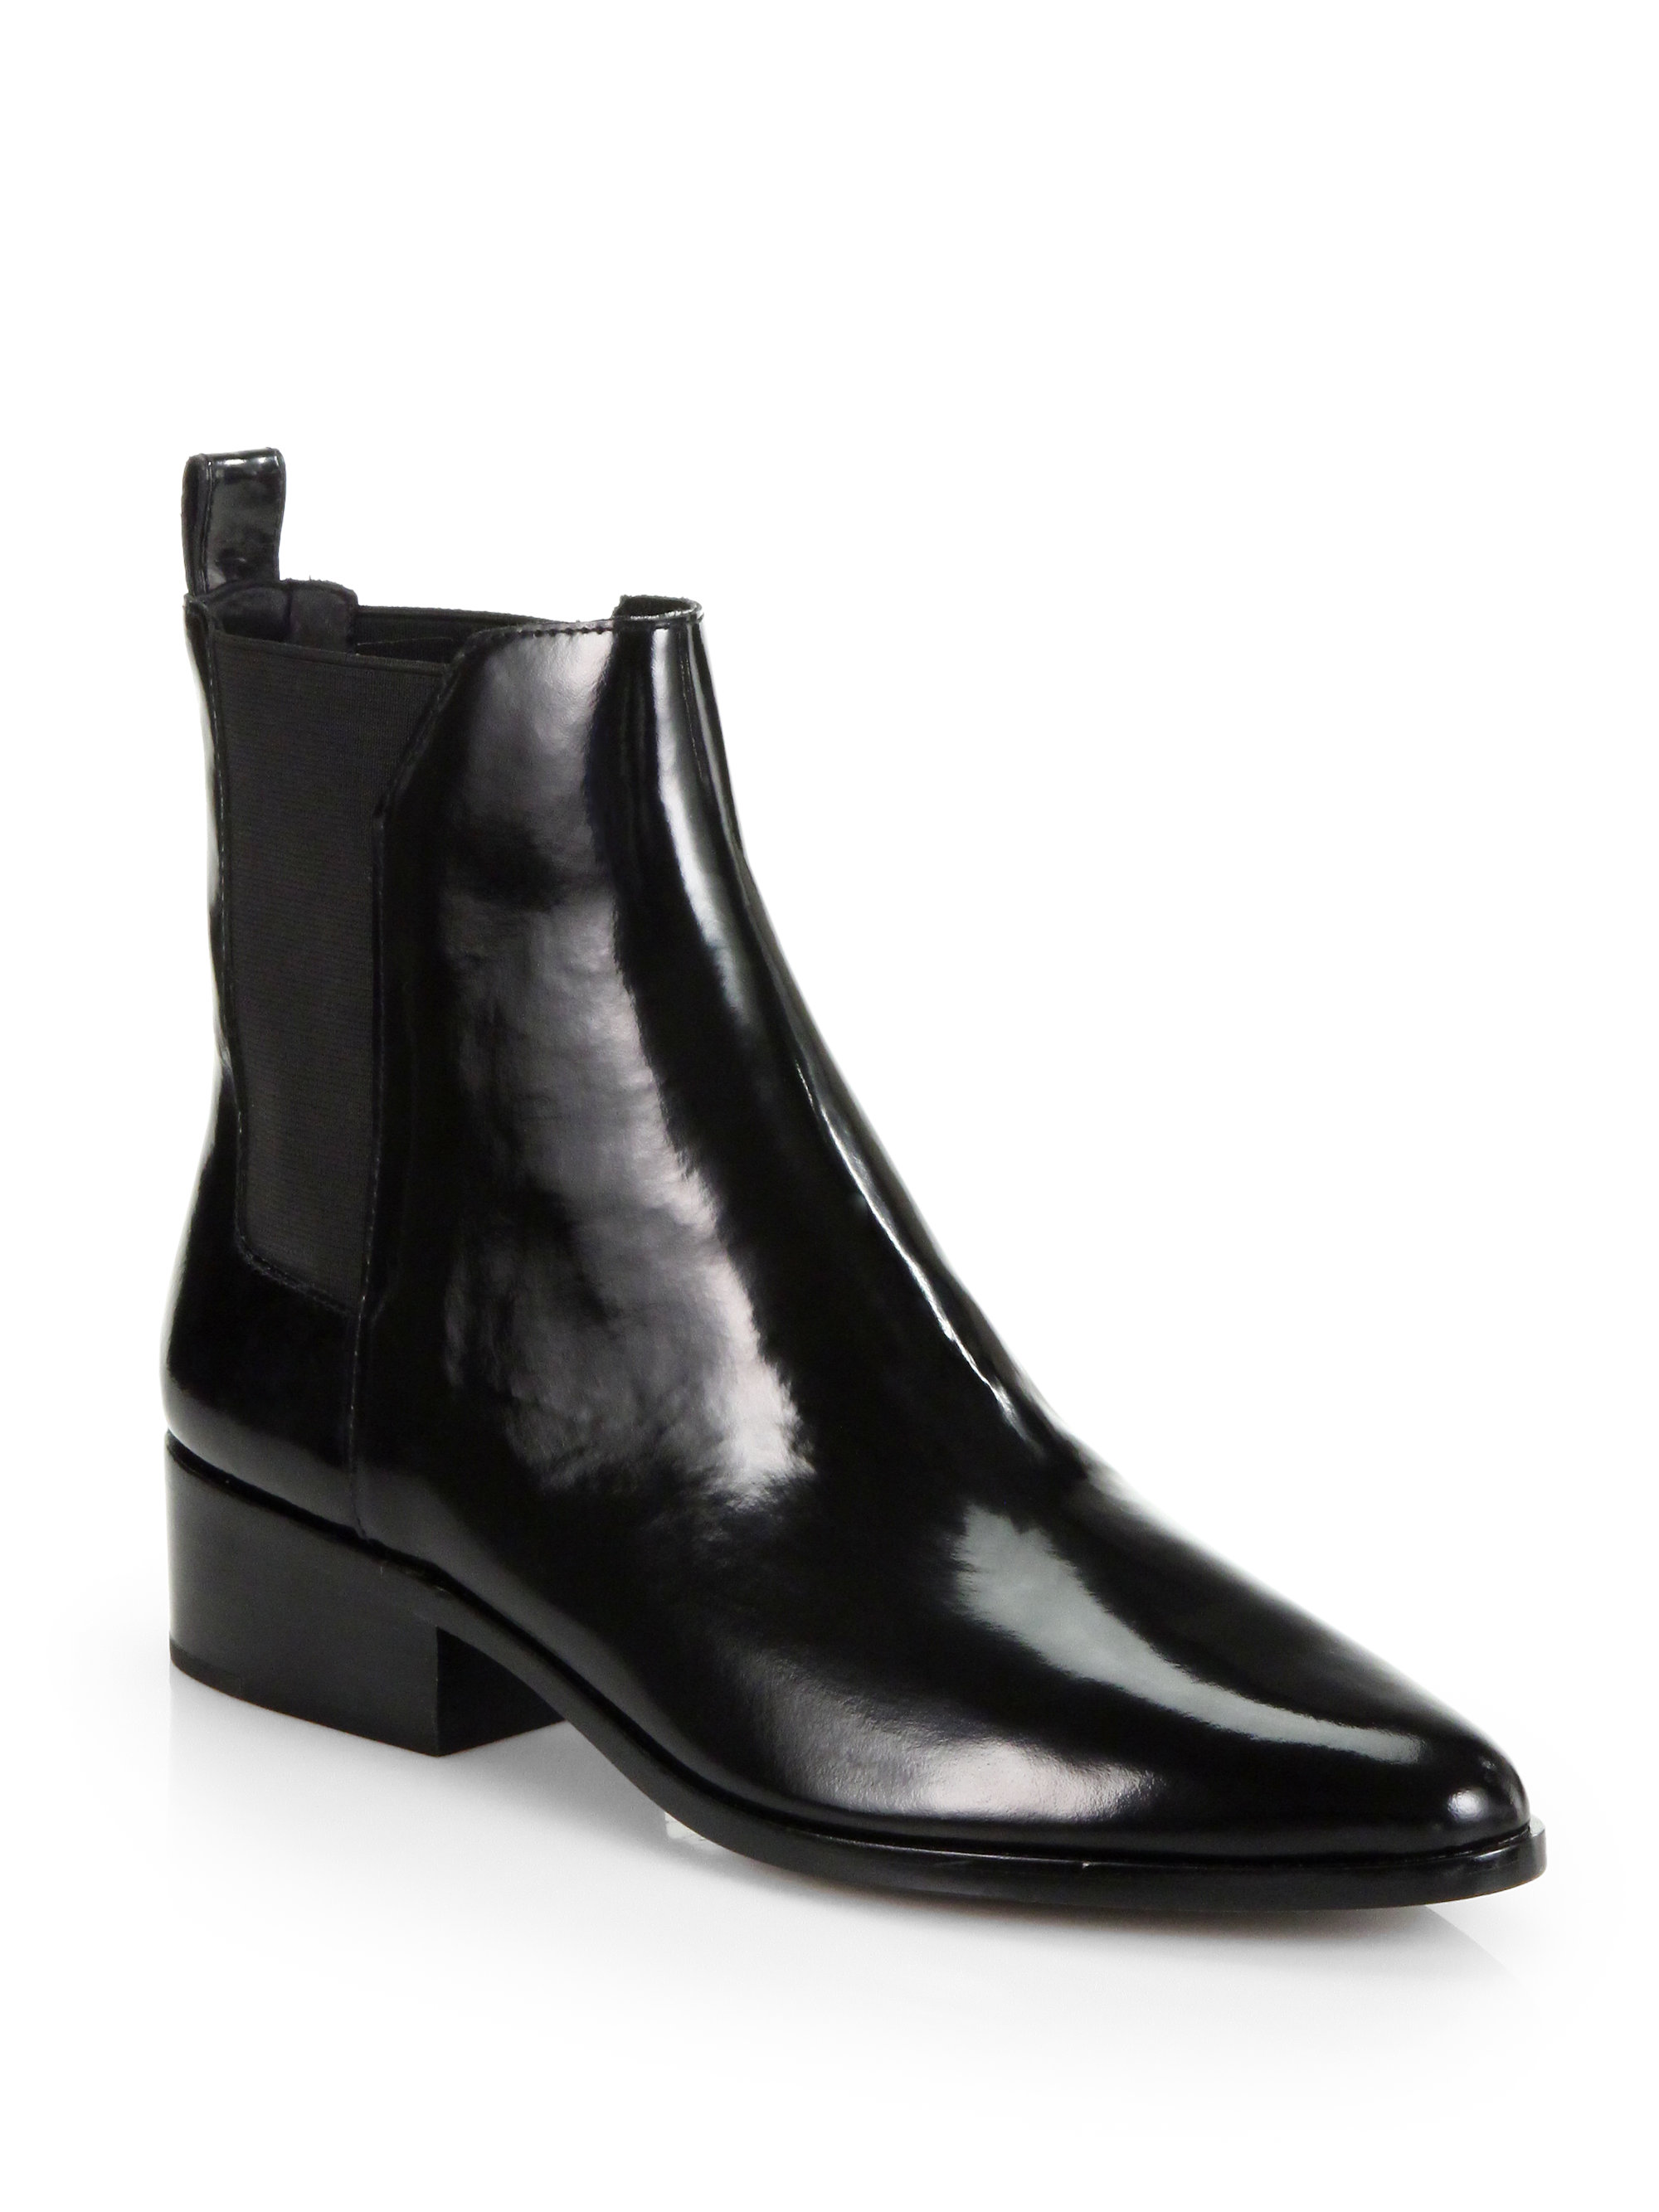 3.1 Phillip Lim Black Leather Ankle Boots 6iqCuMSTDZ